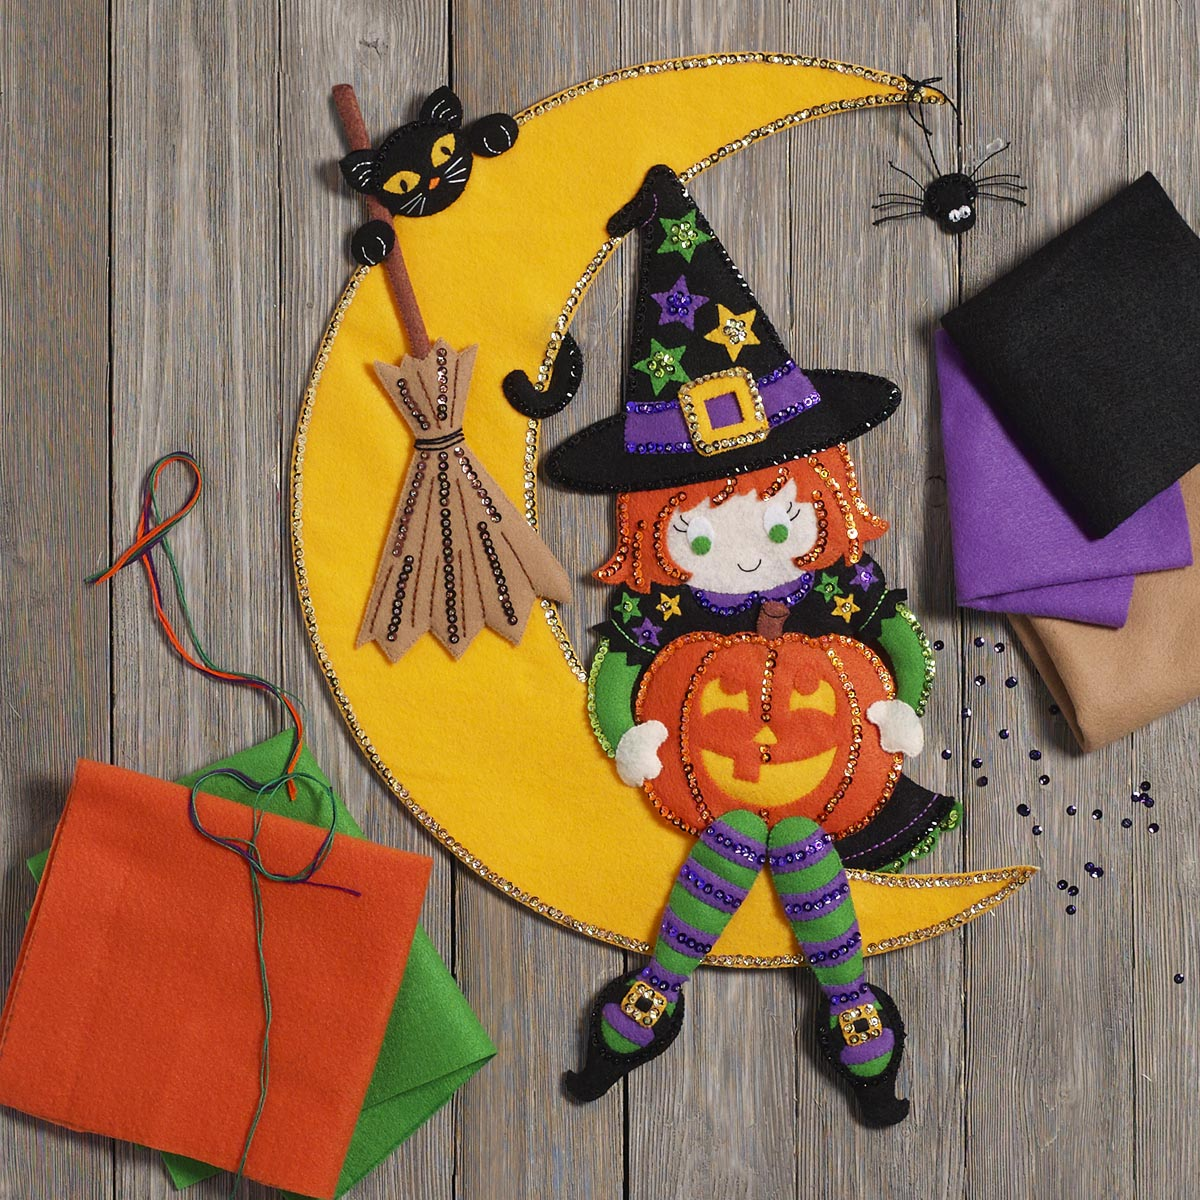 Bucilla ® Seasonal - Felt - Home Decor - Witching Moon Wall Hanging